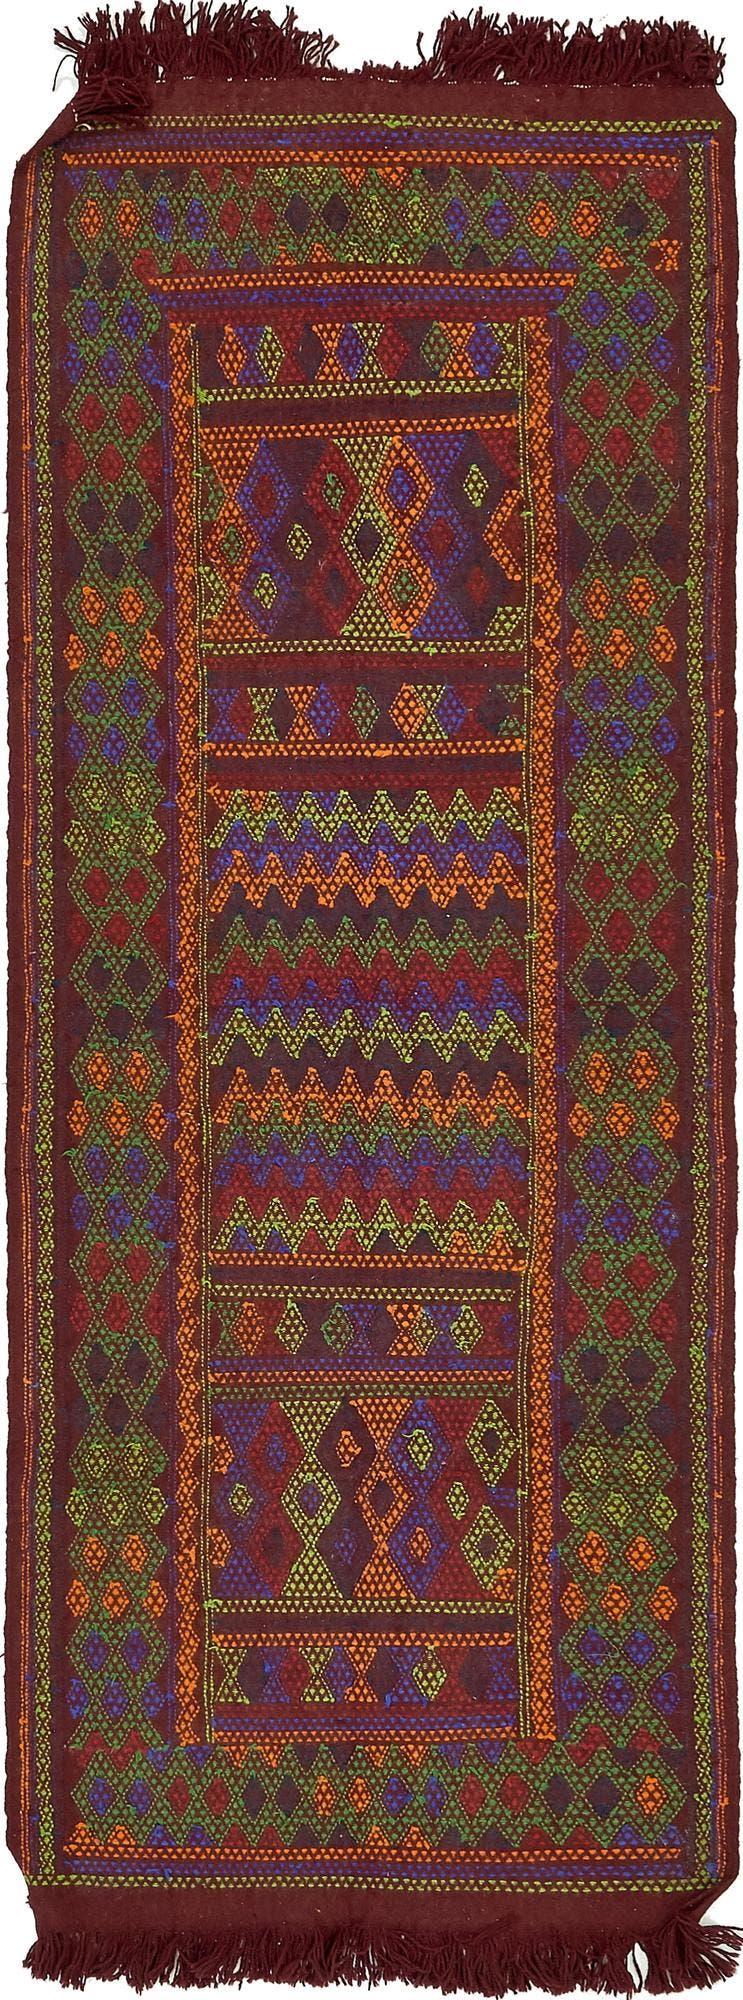 3' 6 x 9' 2 Moroccan Runner Rug main image